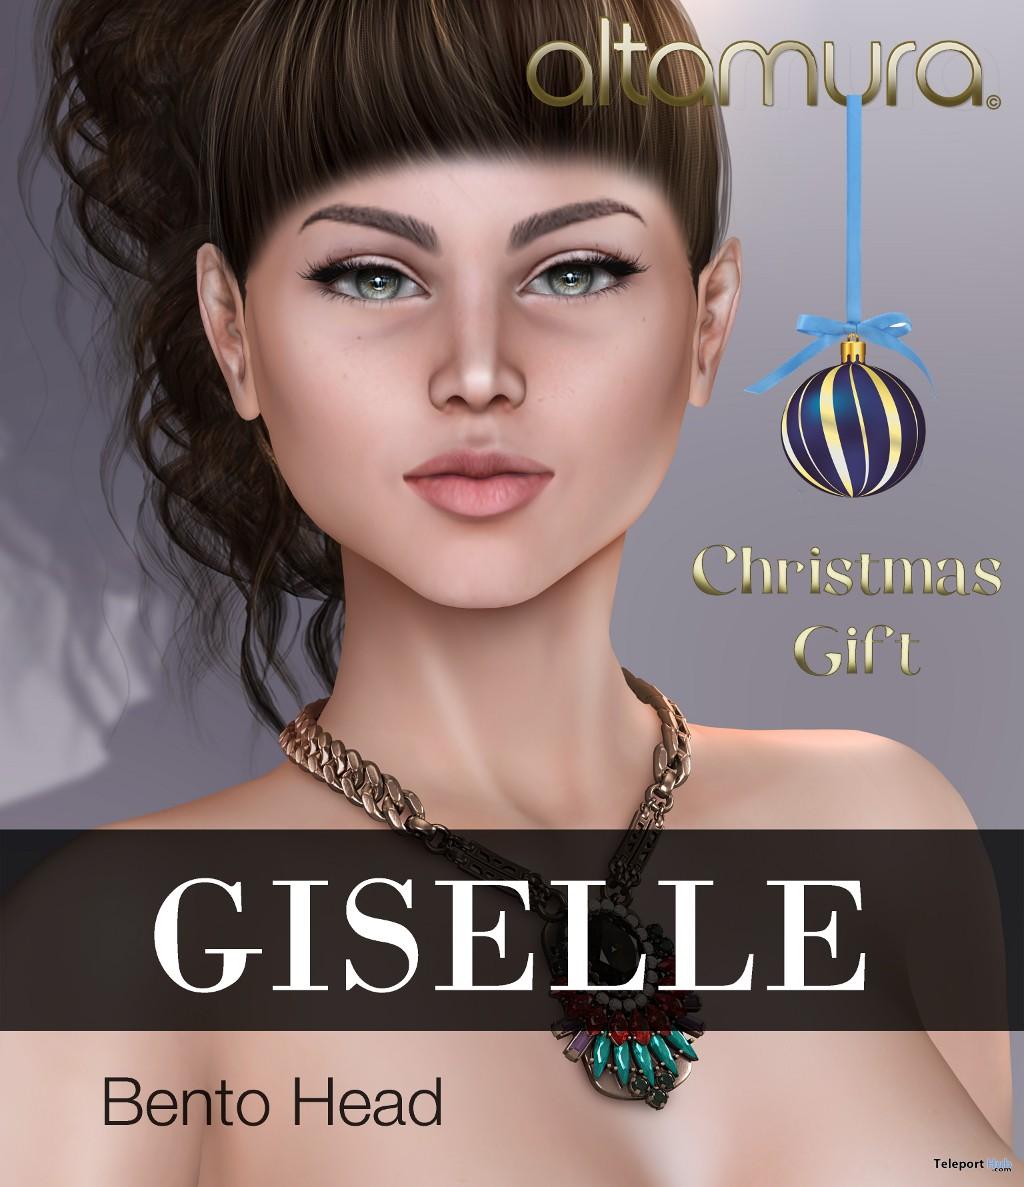 Giselle Bento Head Christmas 2017 Group Gift by Altamura - Teleport Hub - teleporthub.com